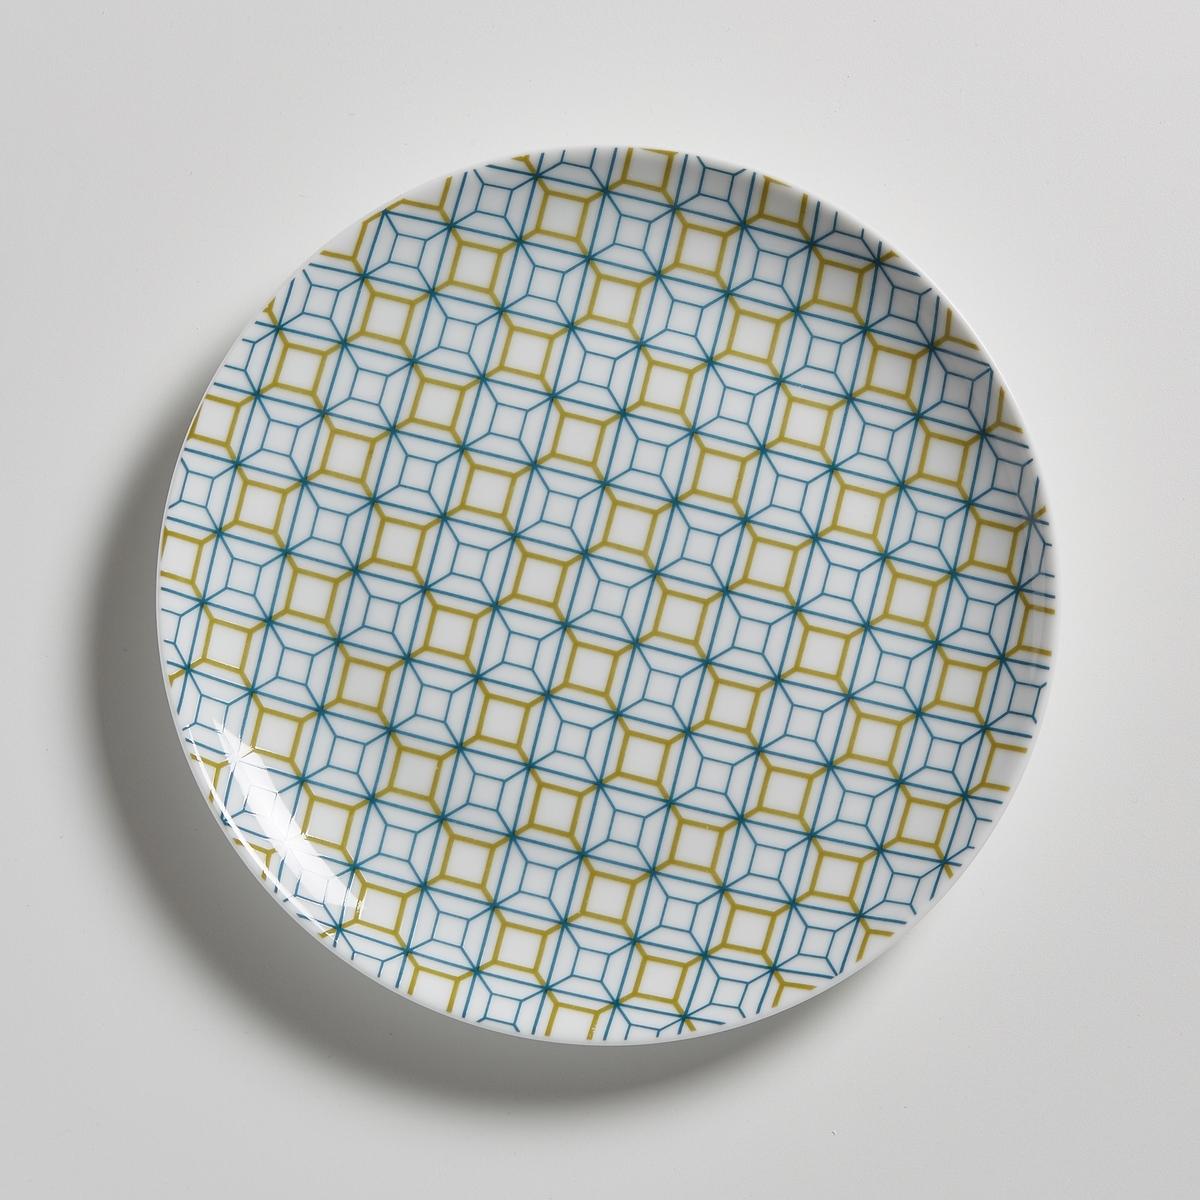 Комплект из 4 десертных тарелок  фарфора